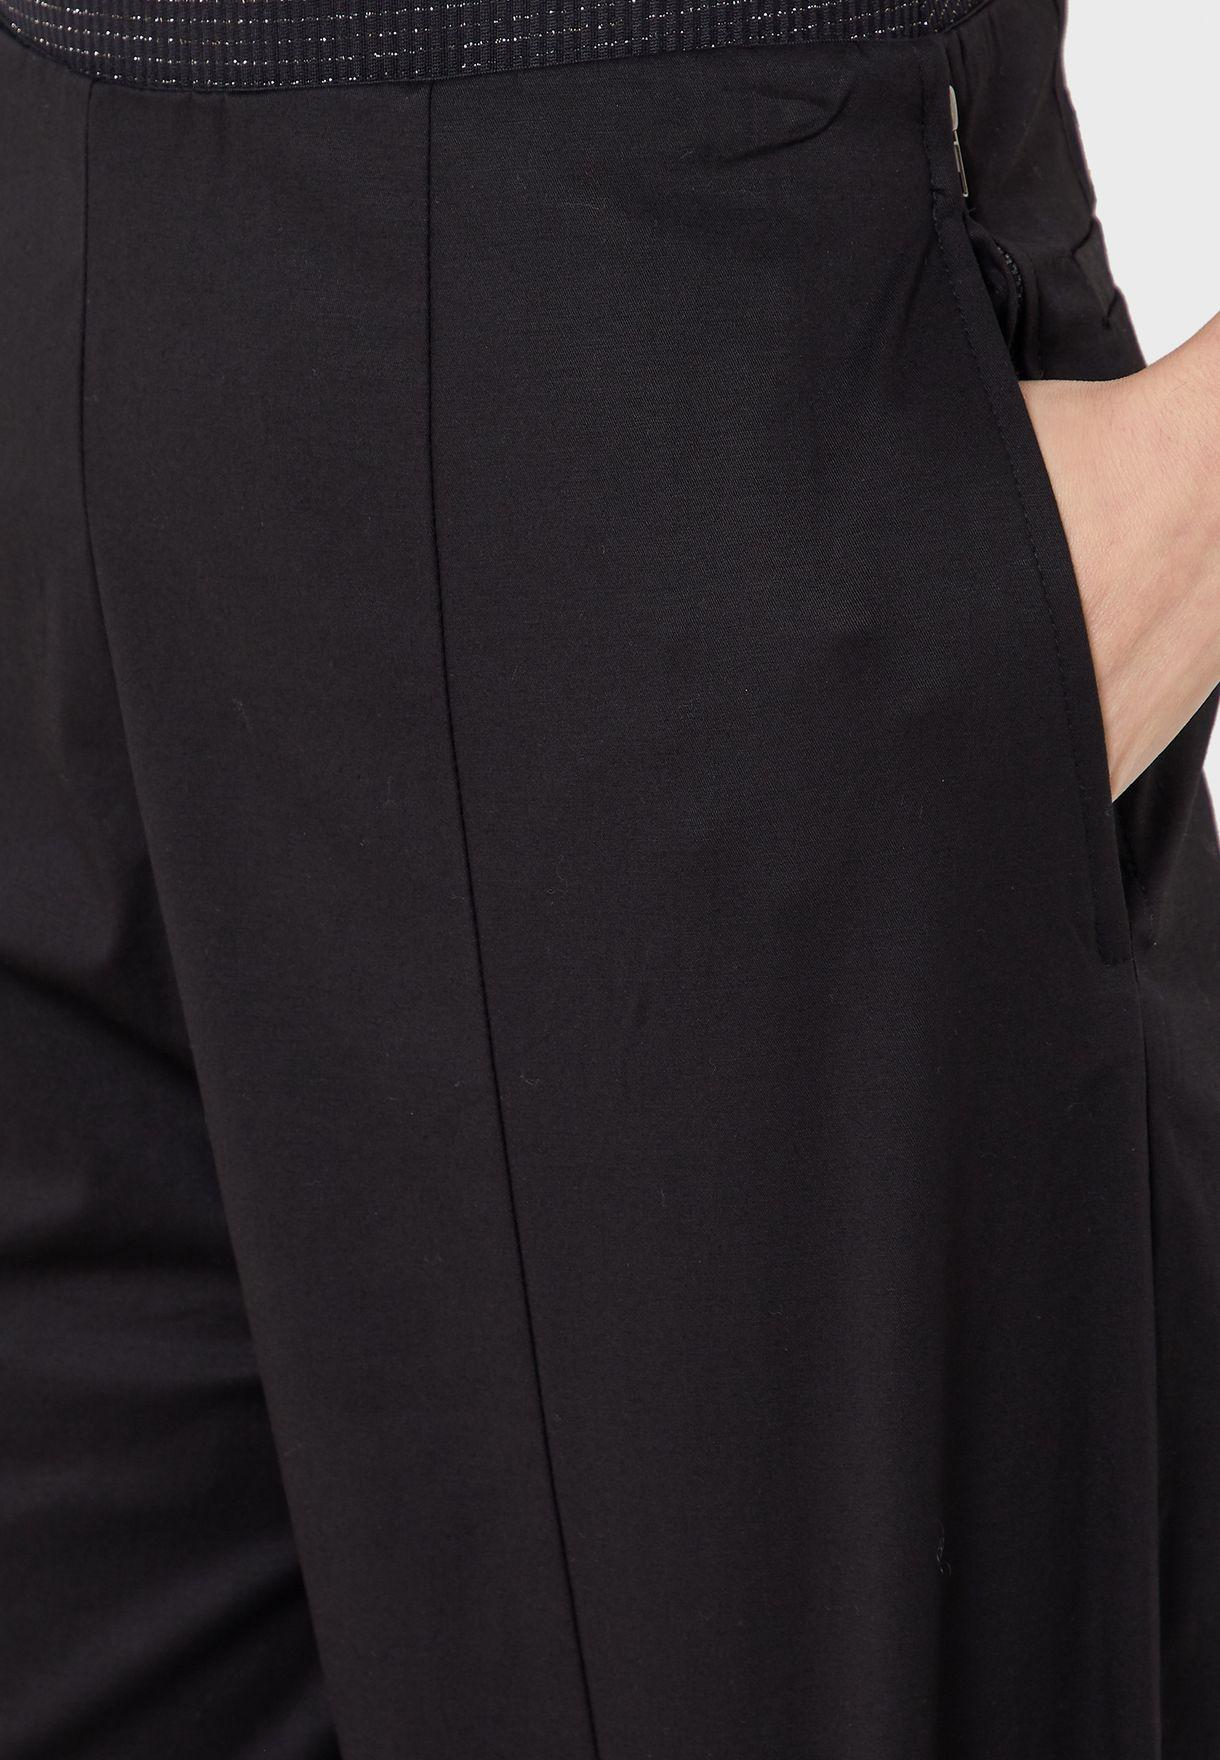 Buy Anotah Black Balloon Pants For Women, Uae 24424at11qfp